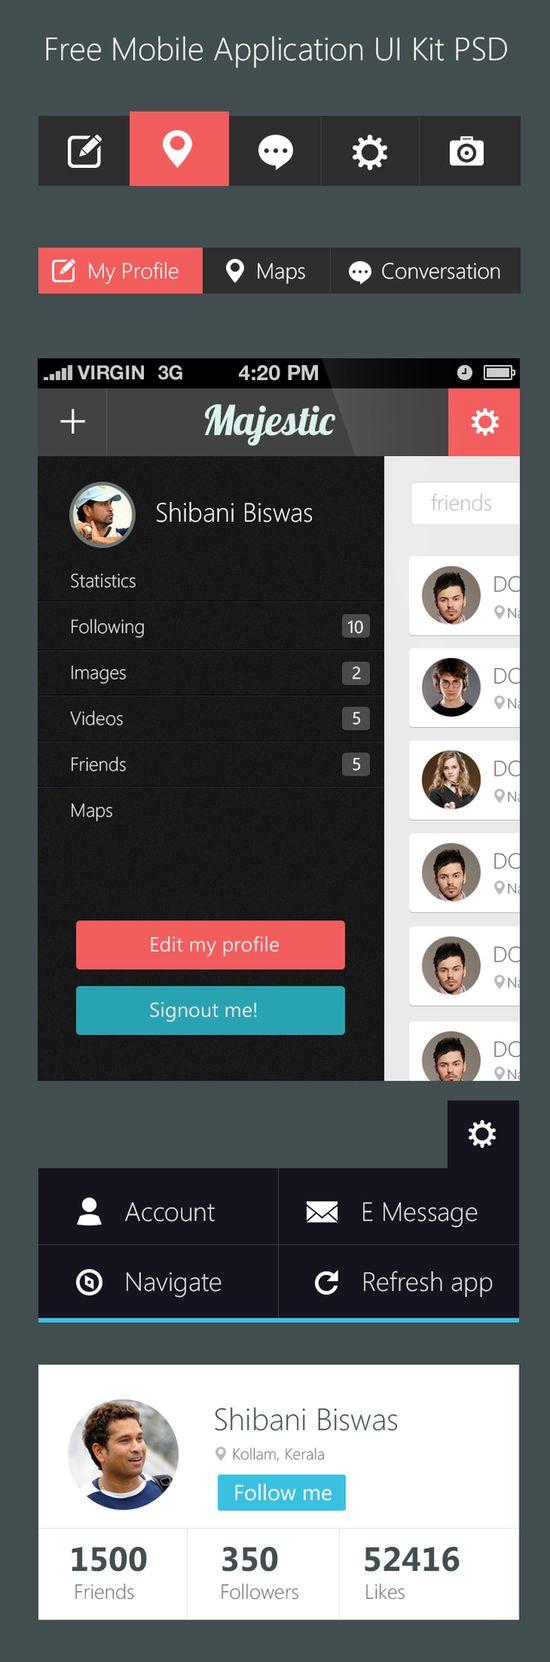 Free Mobile Application UI Kit